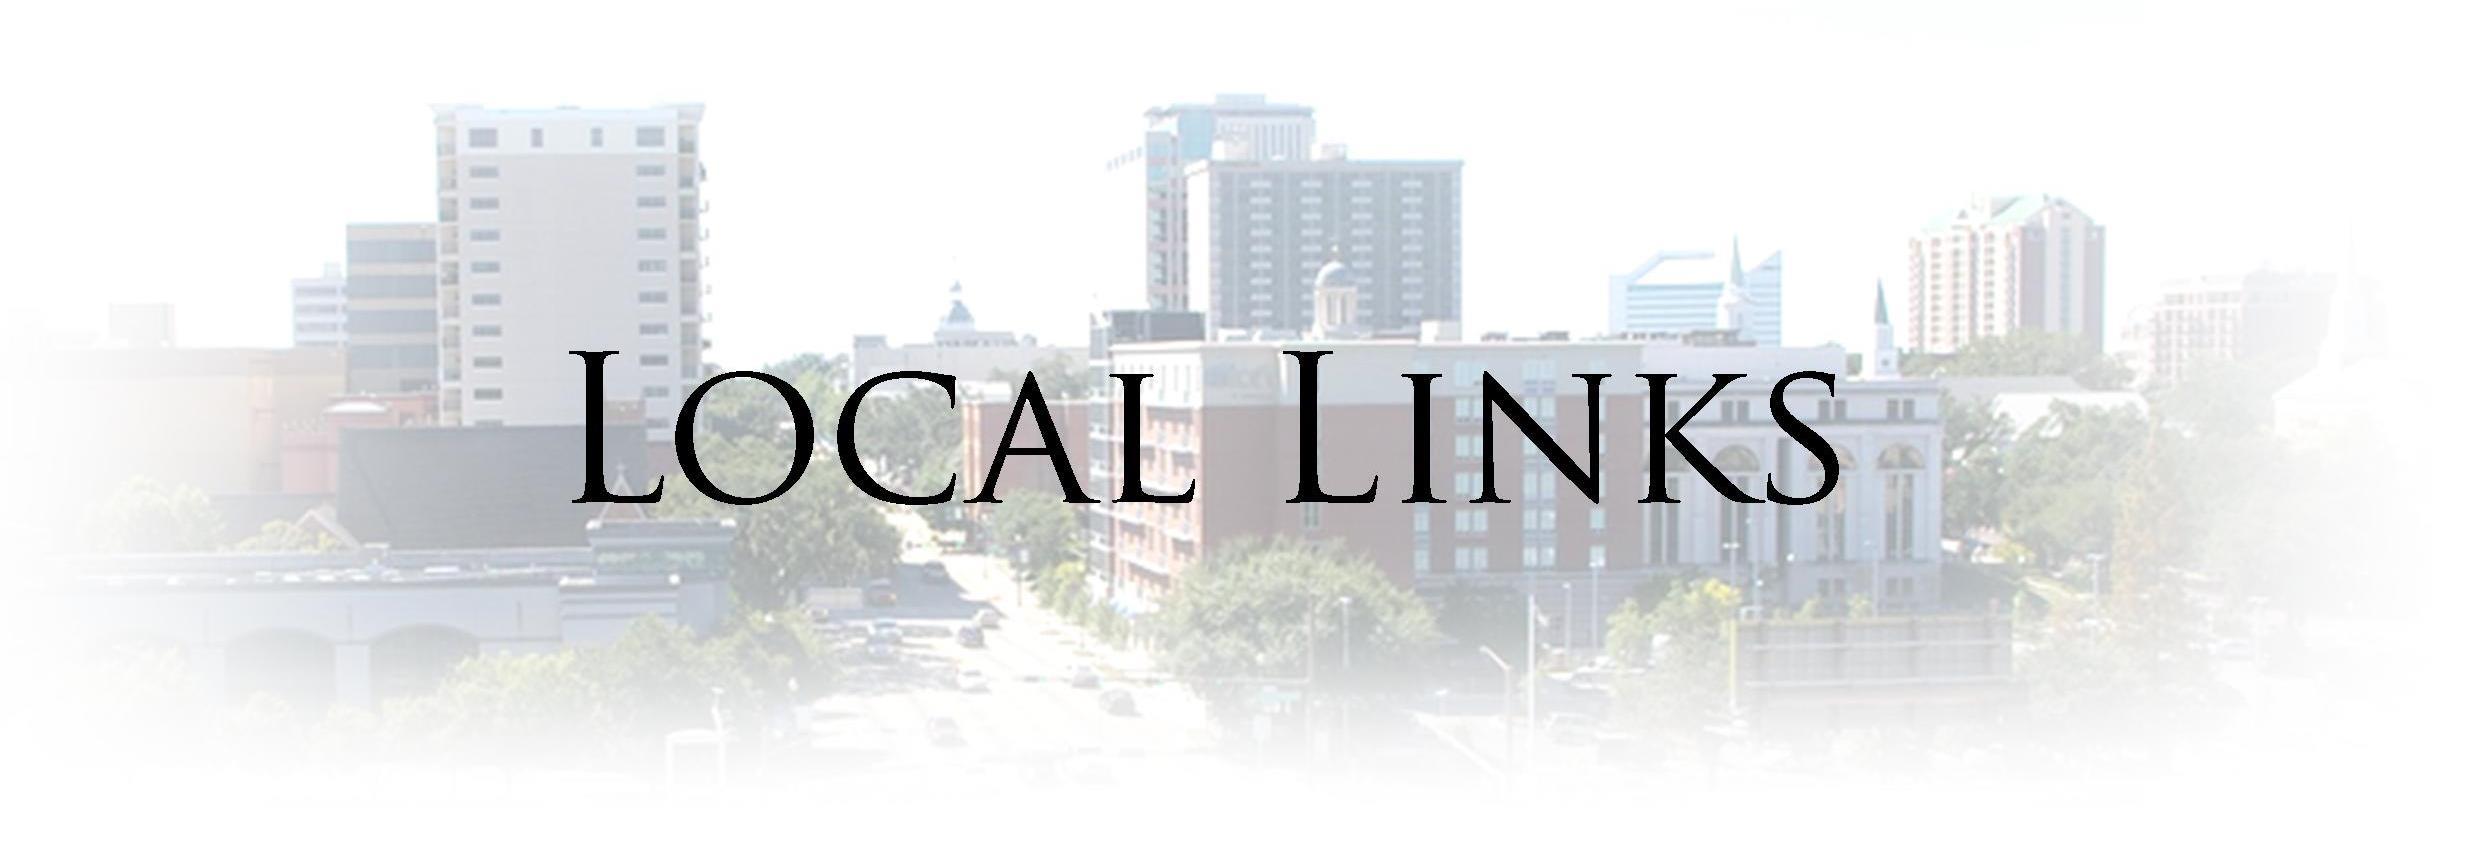 local links2.jpg